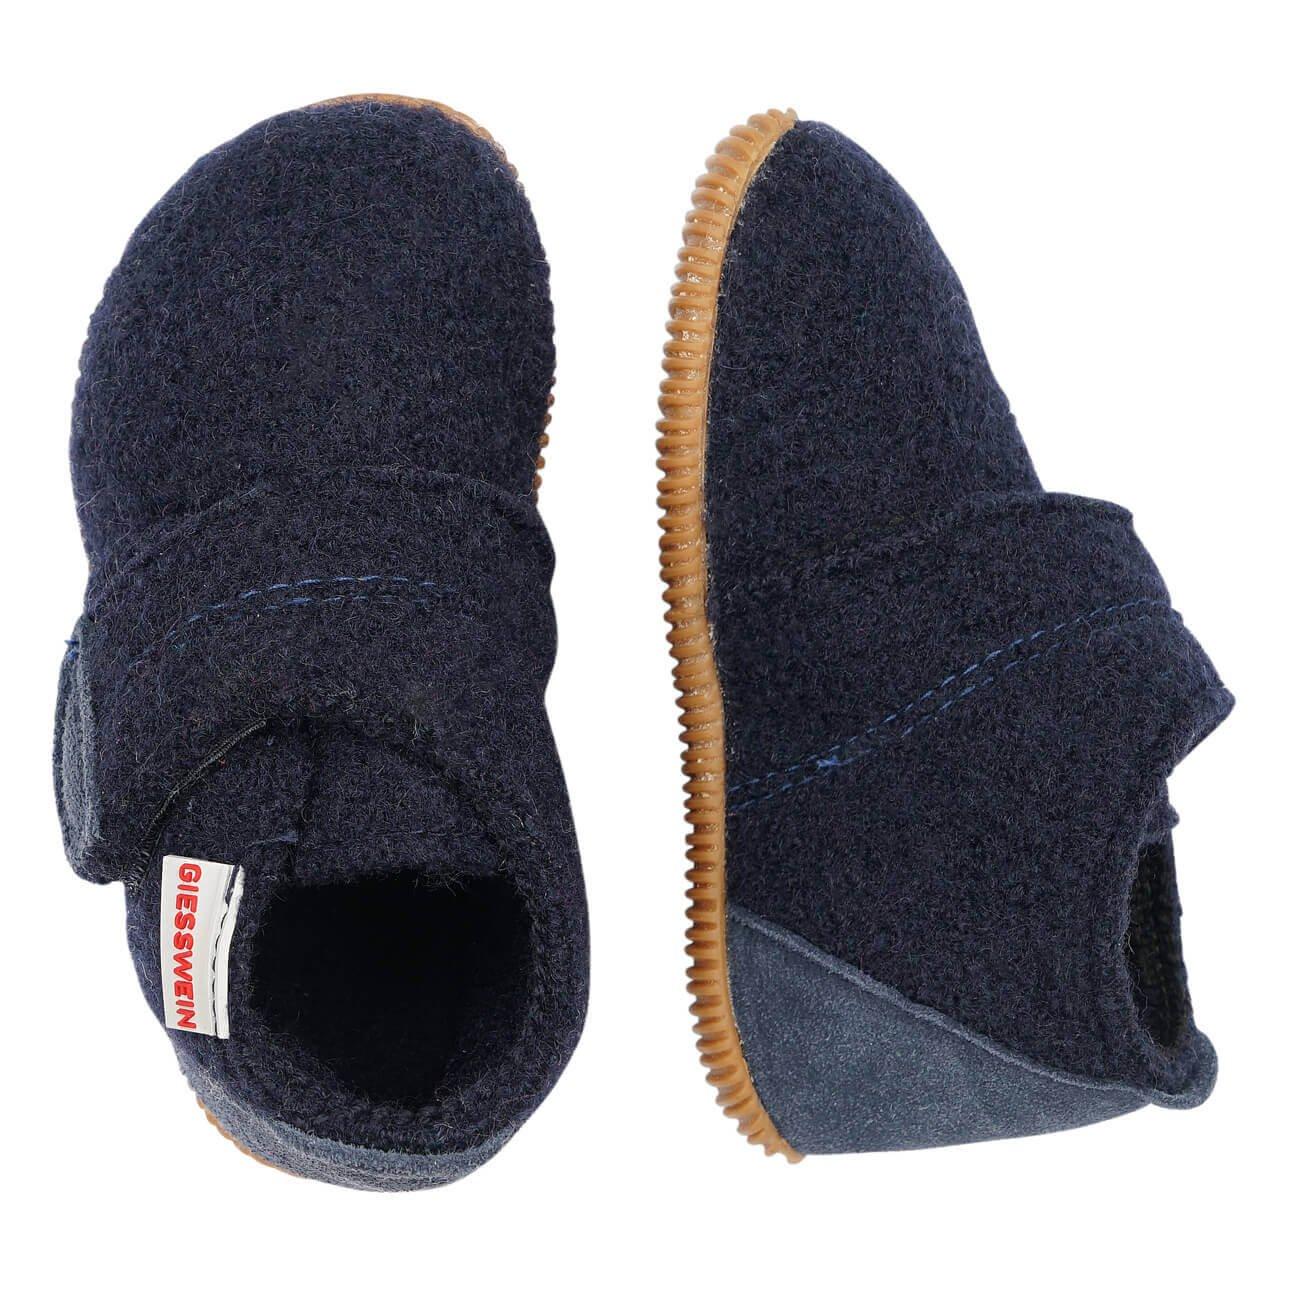 GIESSWEIN Oberstaufen Zapatillas de Estar por casa Unisex Ni/ños